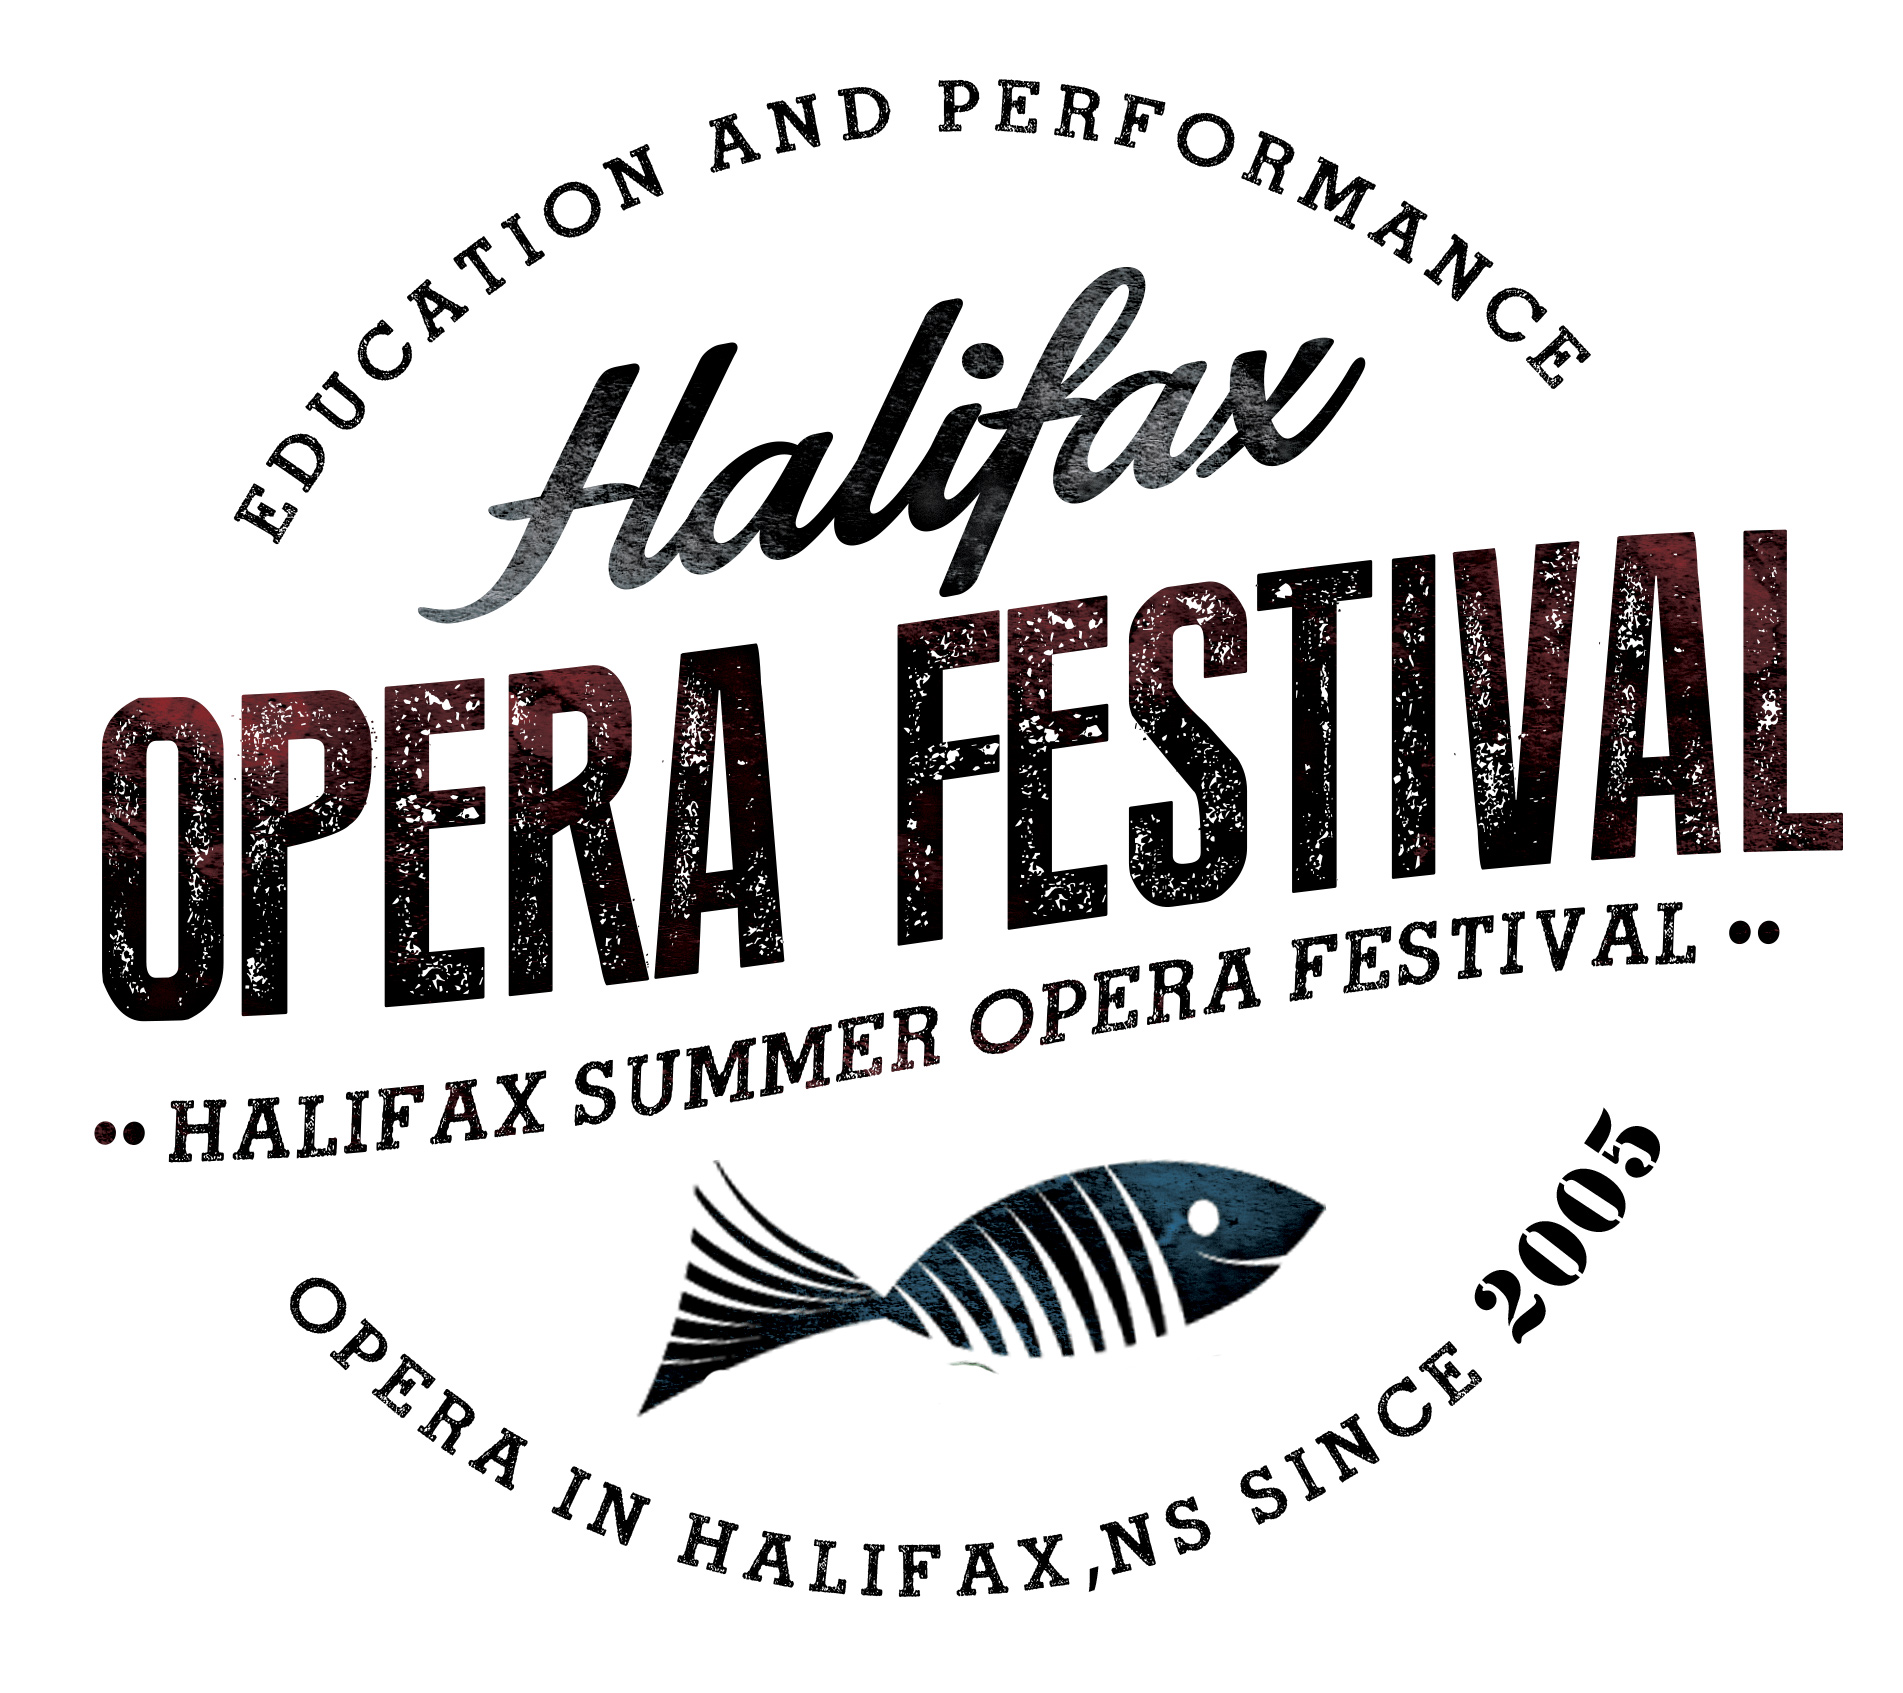 Halifax Summer Opera Festival logo